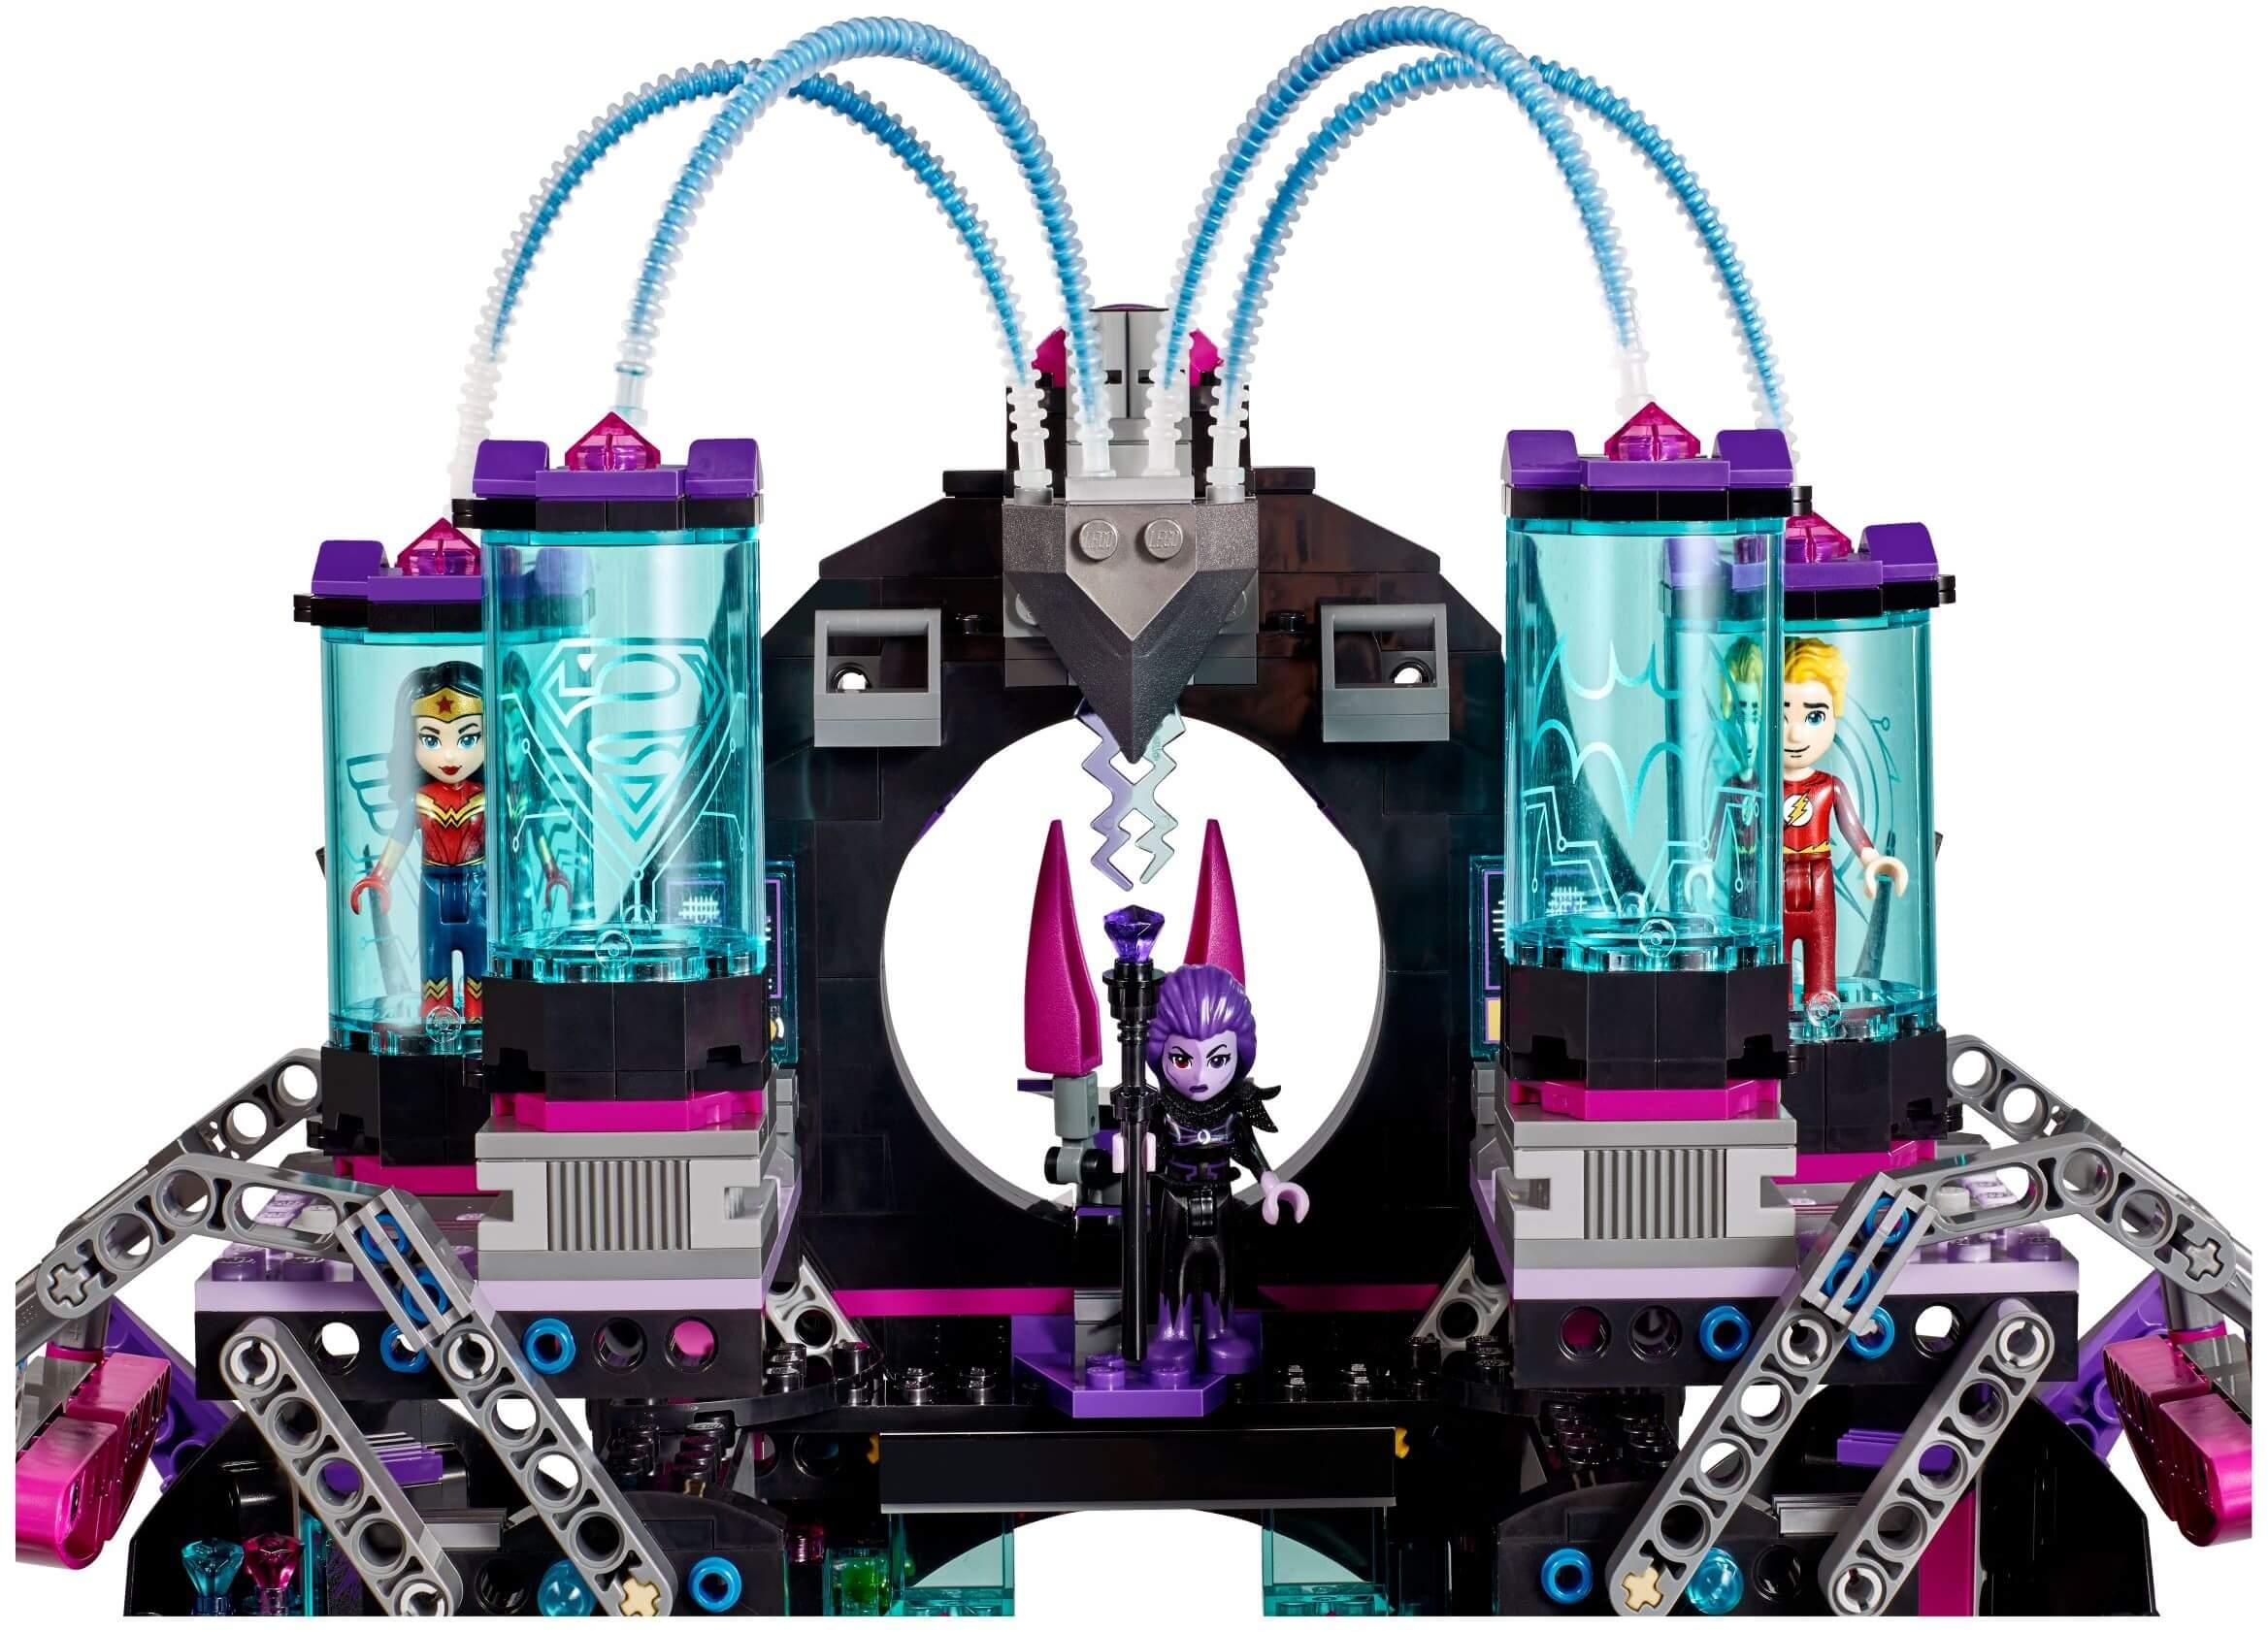 Mua đồ chơi LEGO 41239 - LEGO Super Hero Girls 41239 - Lâu Đài Ma Thuật của Eclipso (LEGO Super Hero Girls Eclipso Dark Palace)